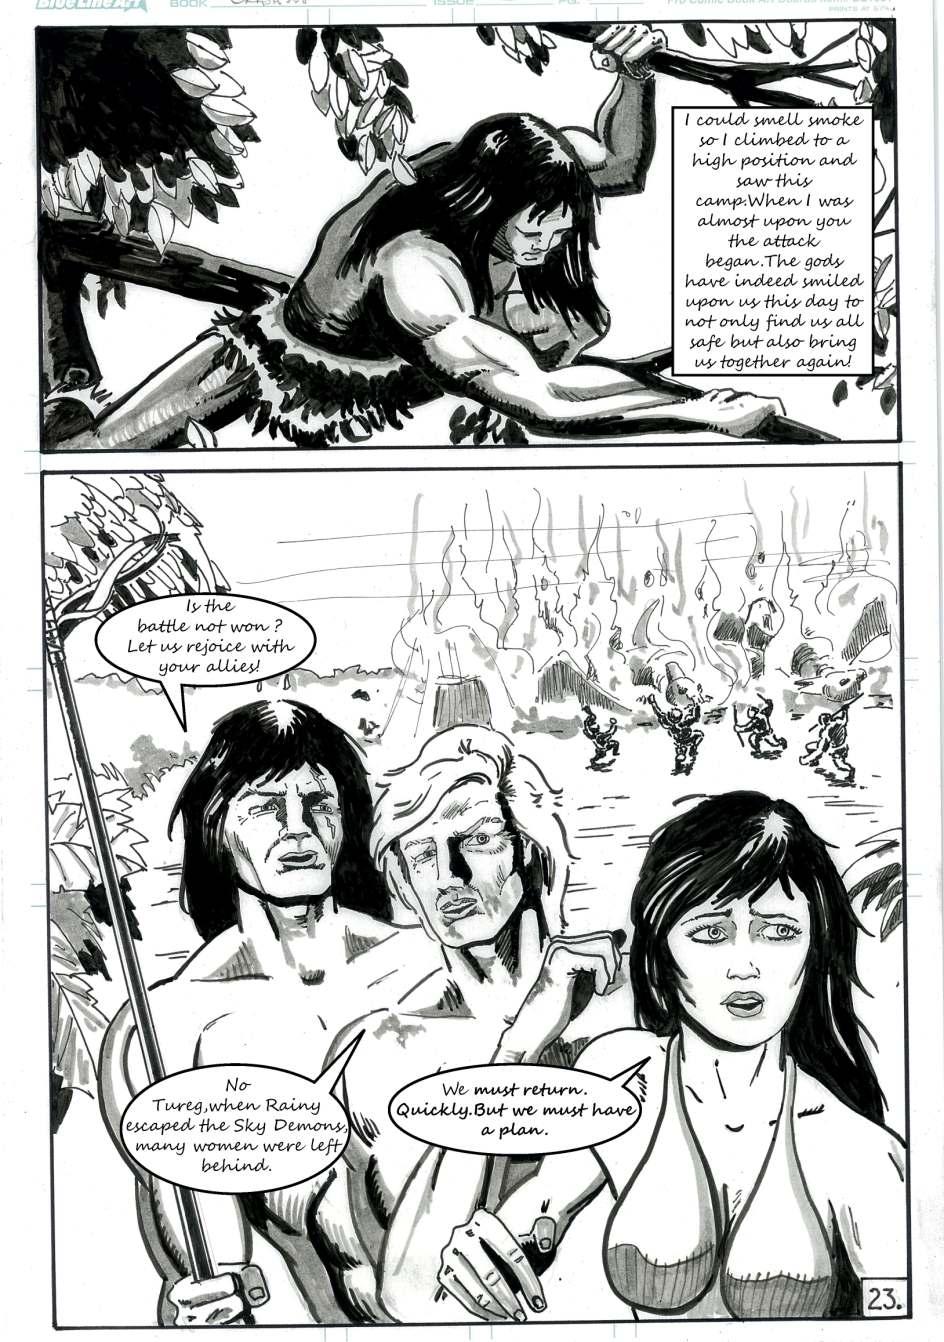 Crash 3! Page 23